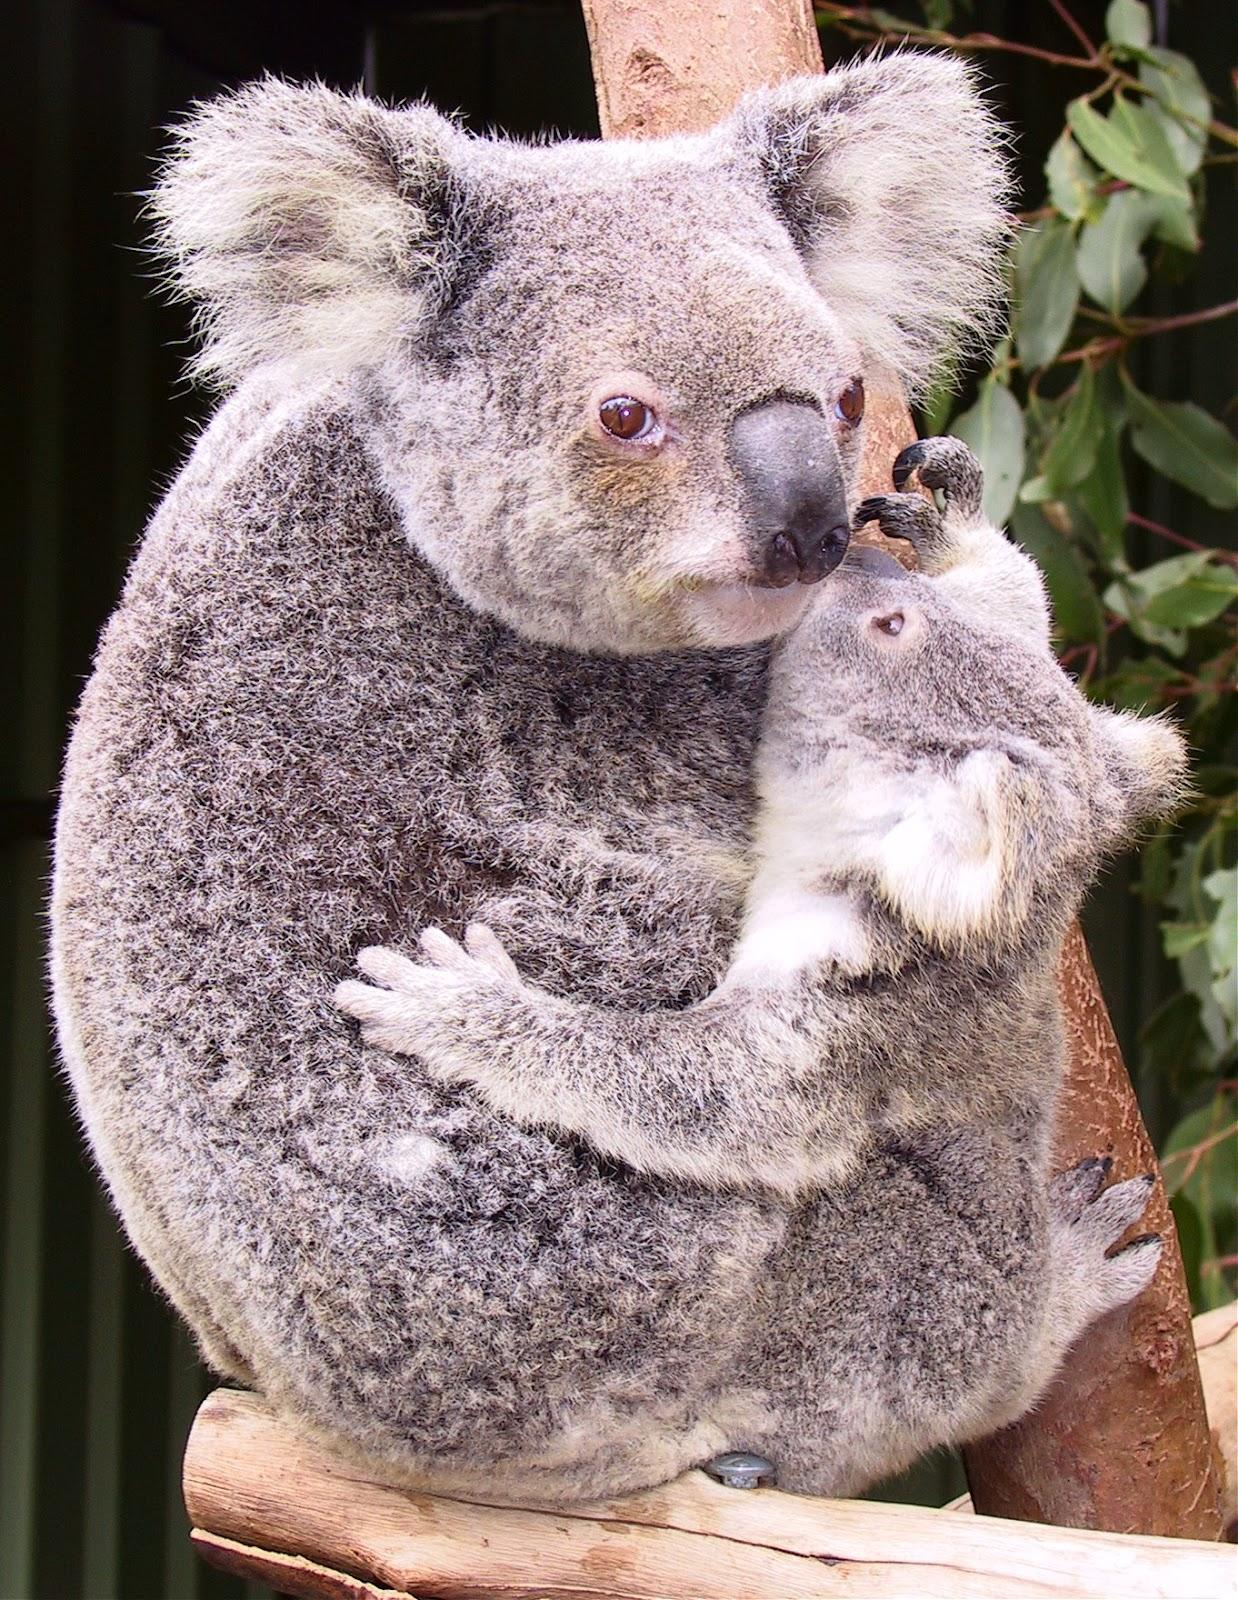 The jungle store keeping baby koalas safe - Pics of baby koalas ...